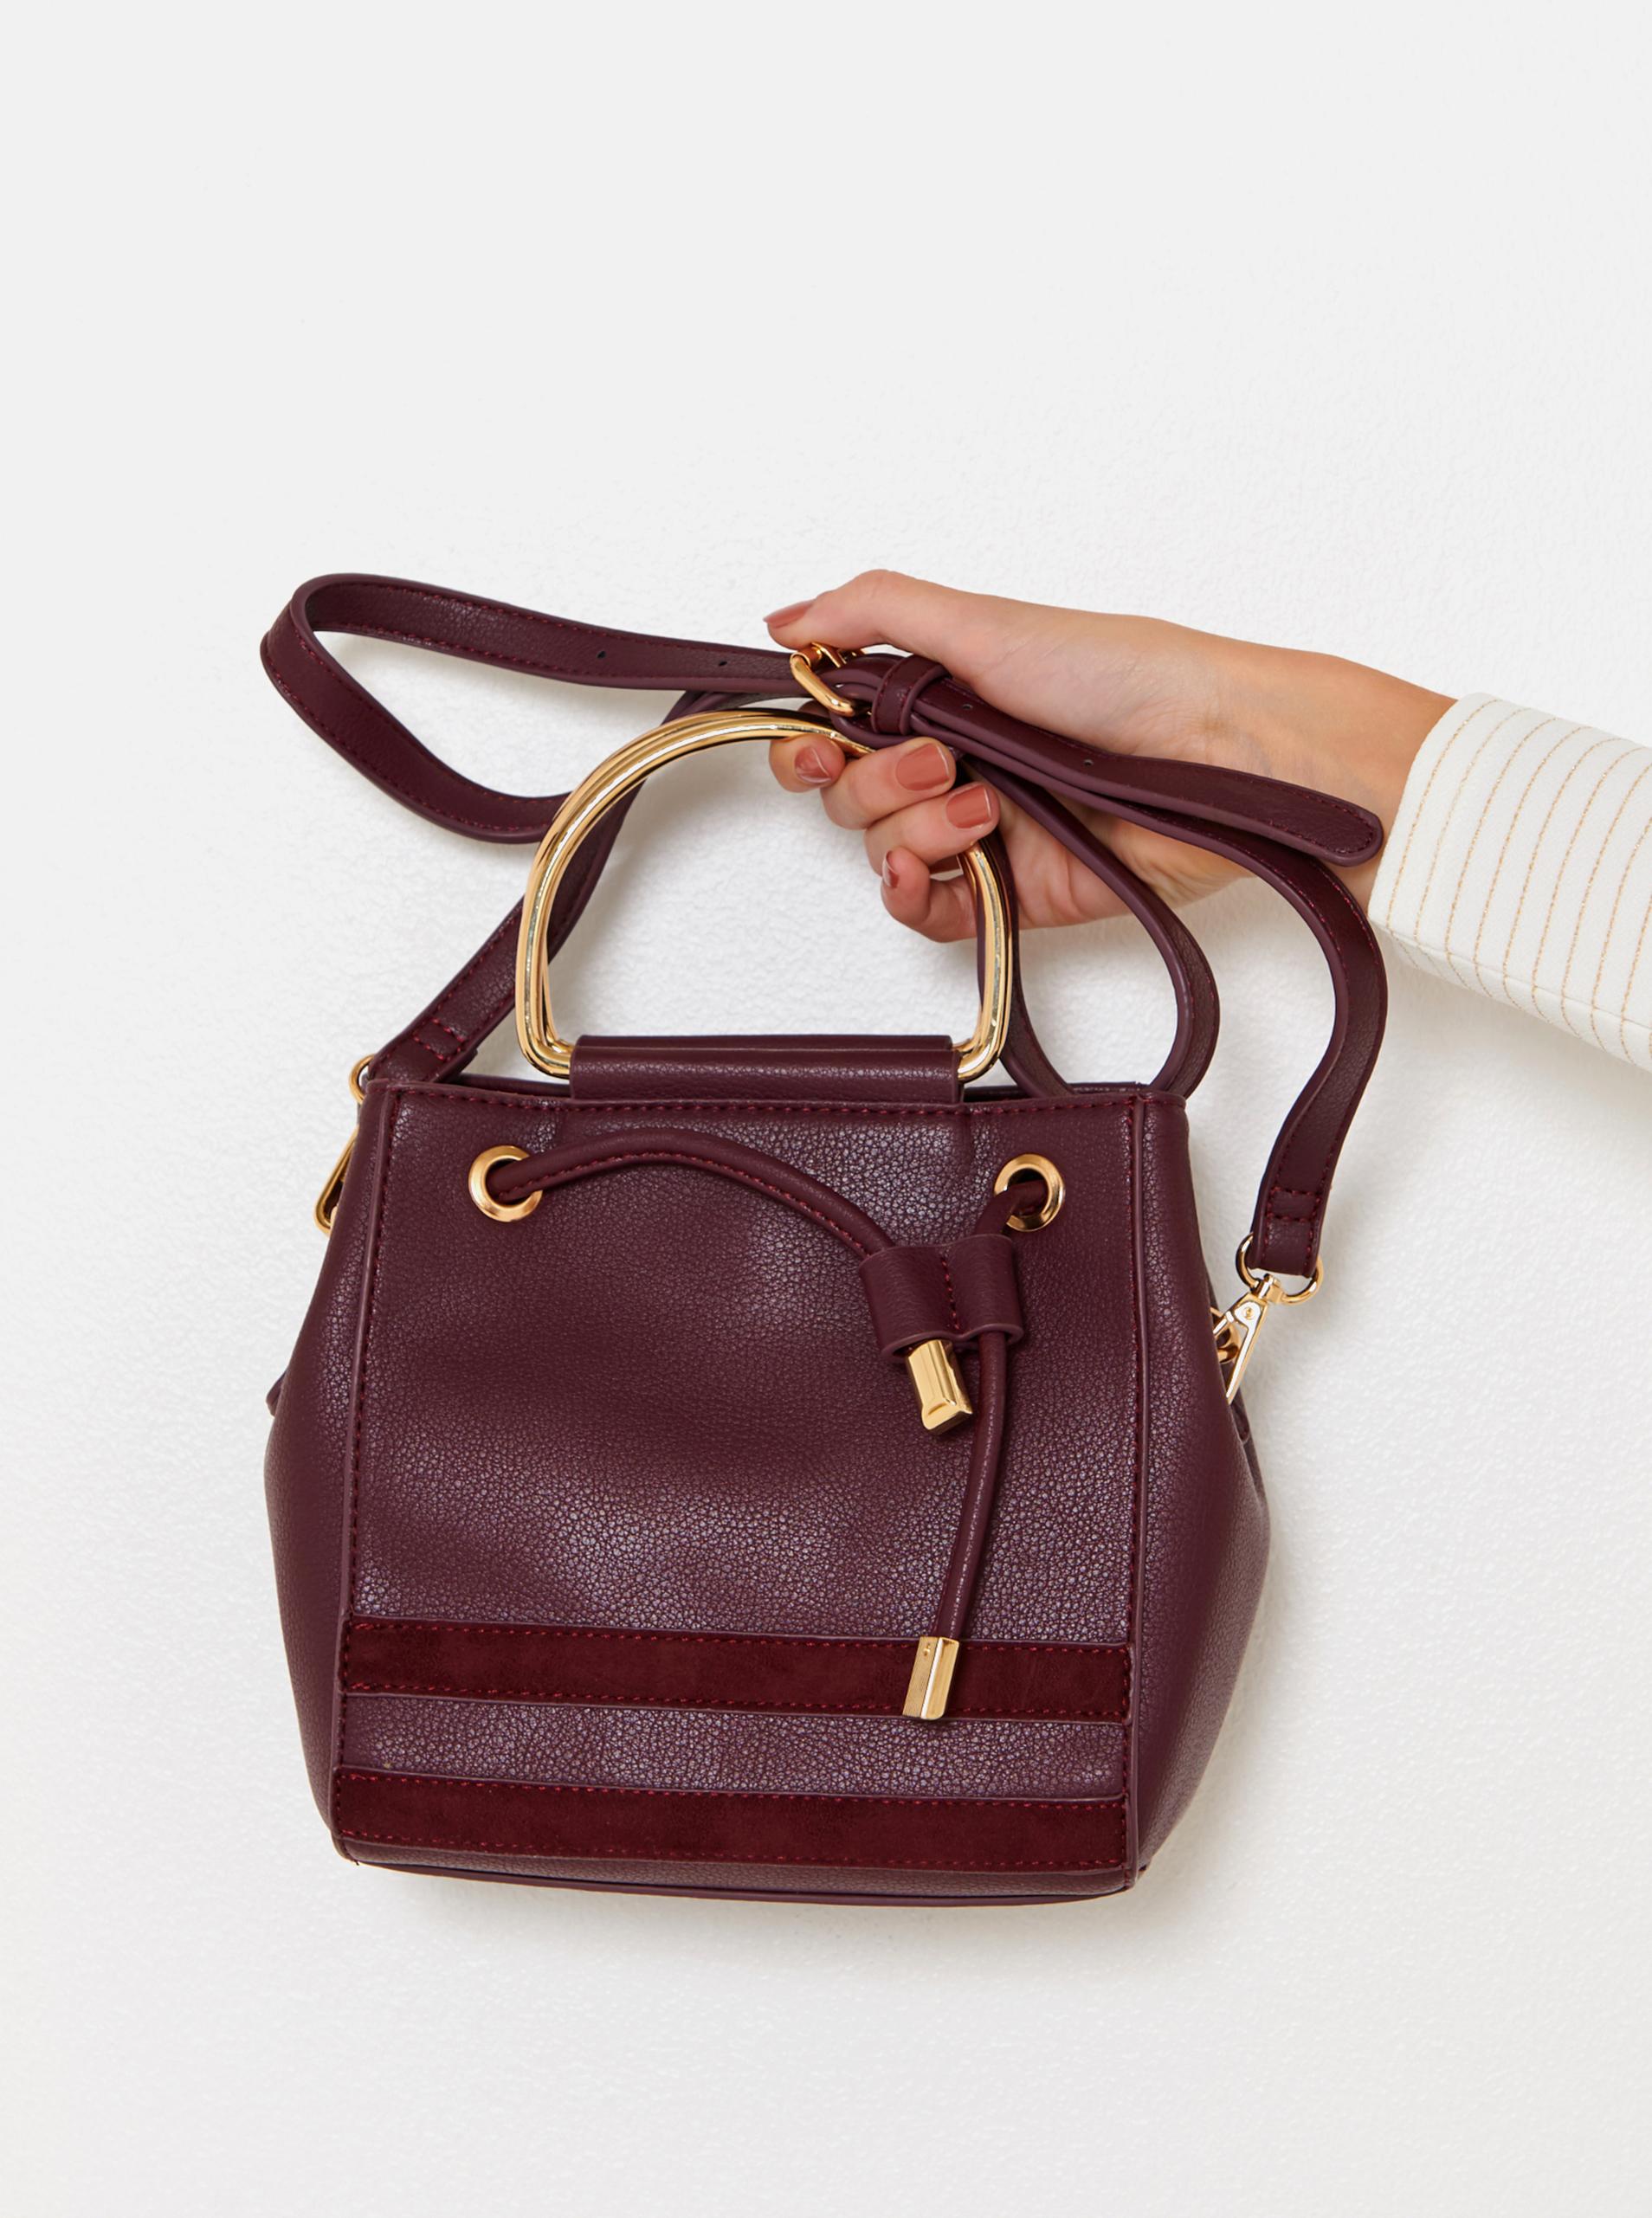 CAMAIEU Women's bag wine red